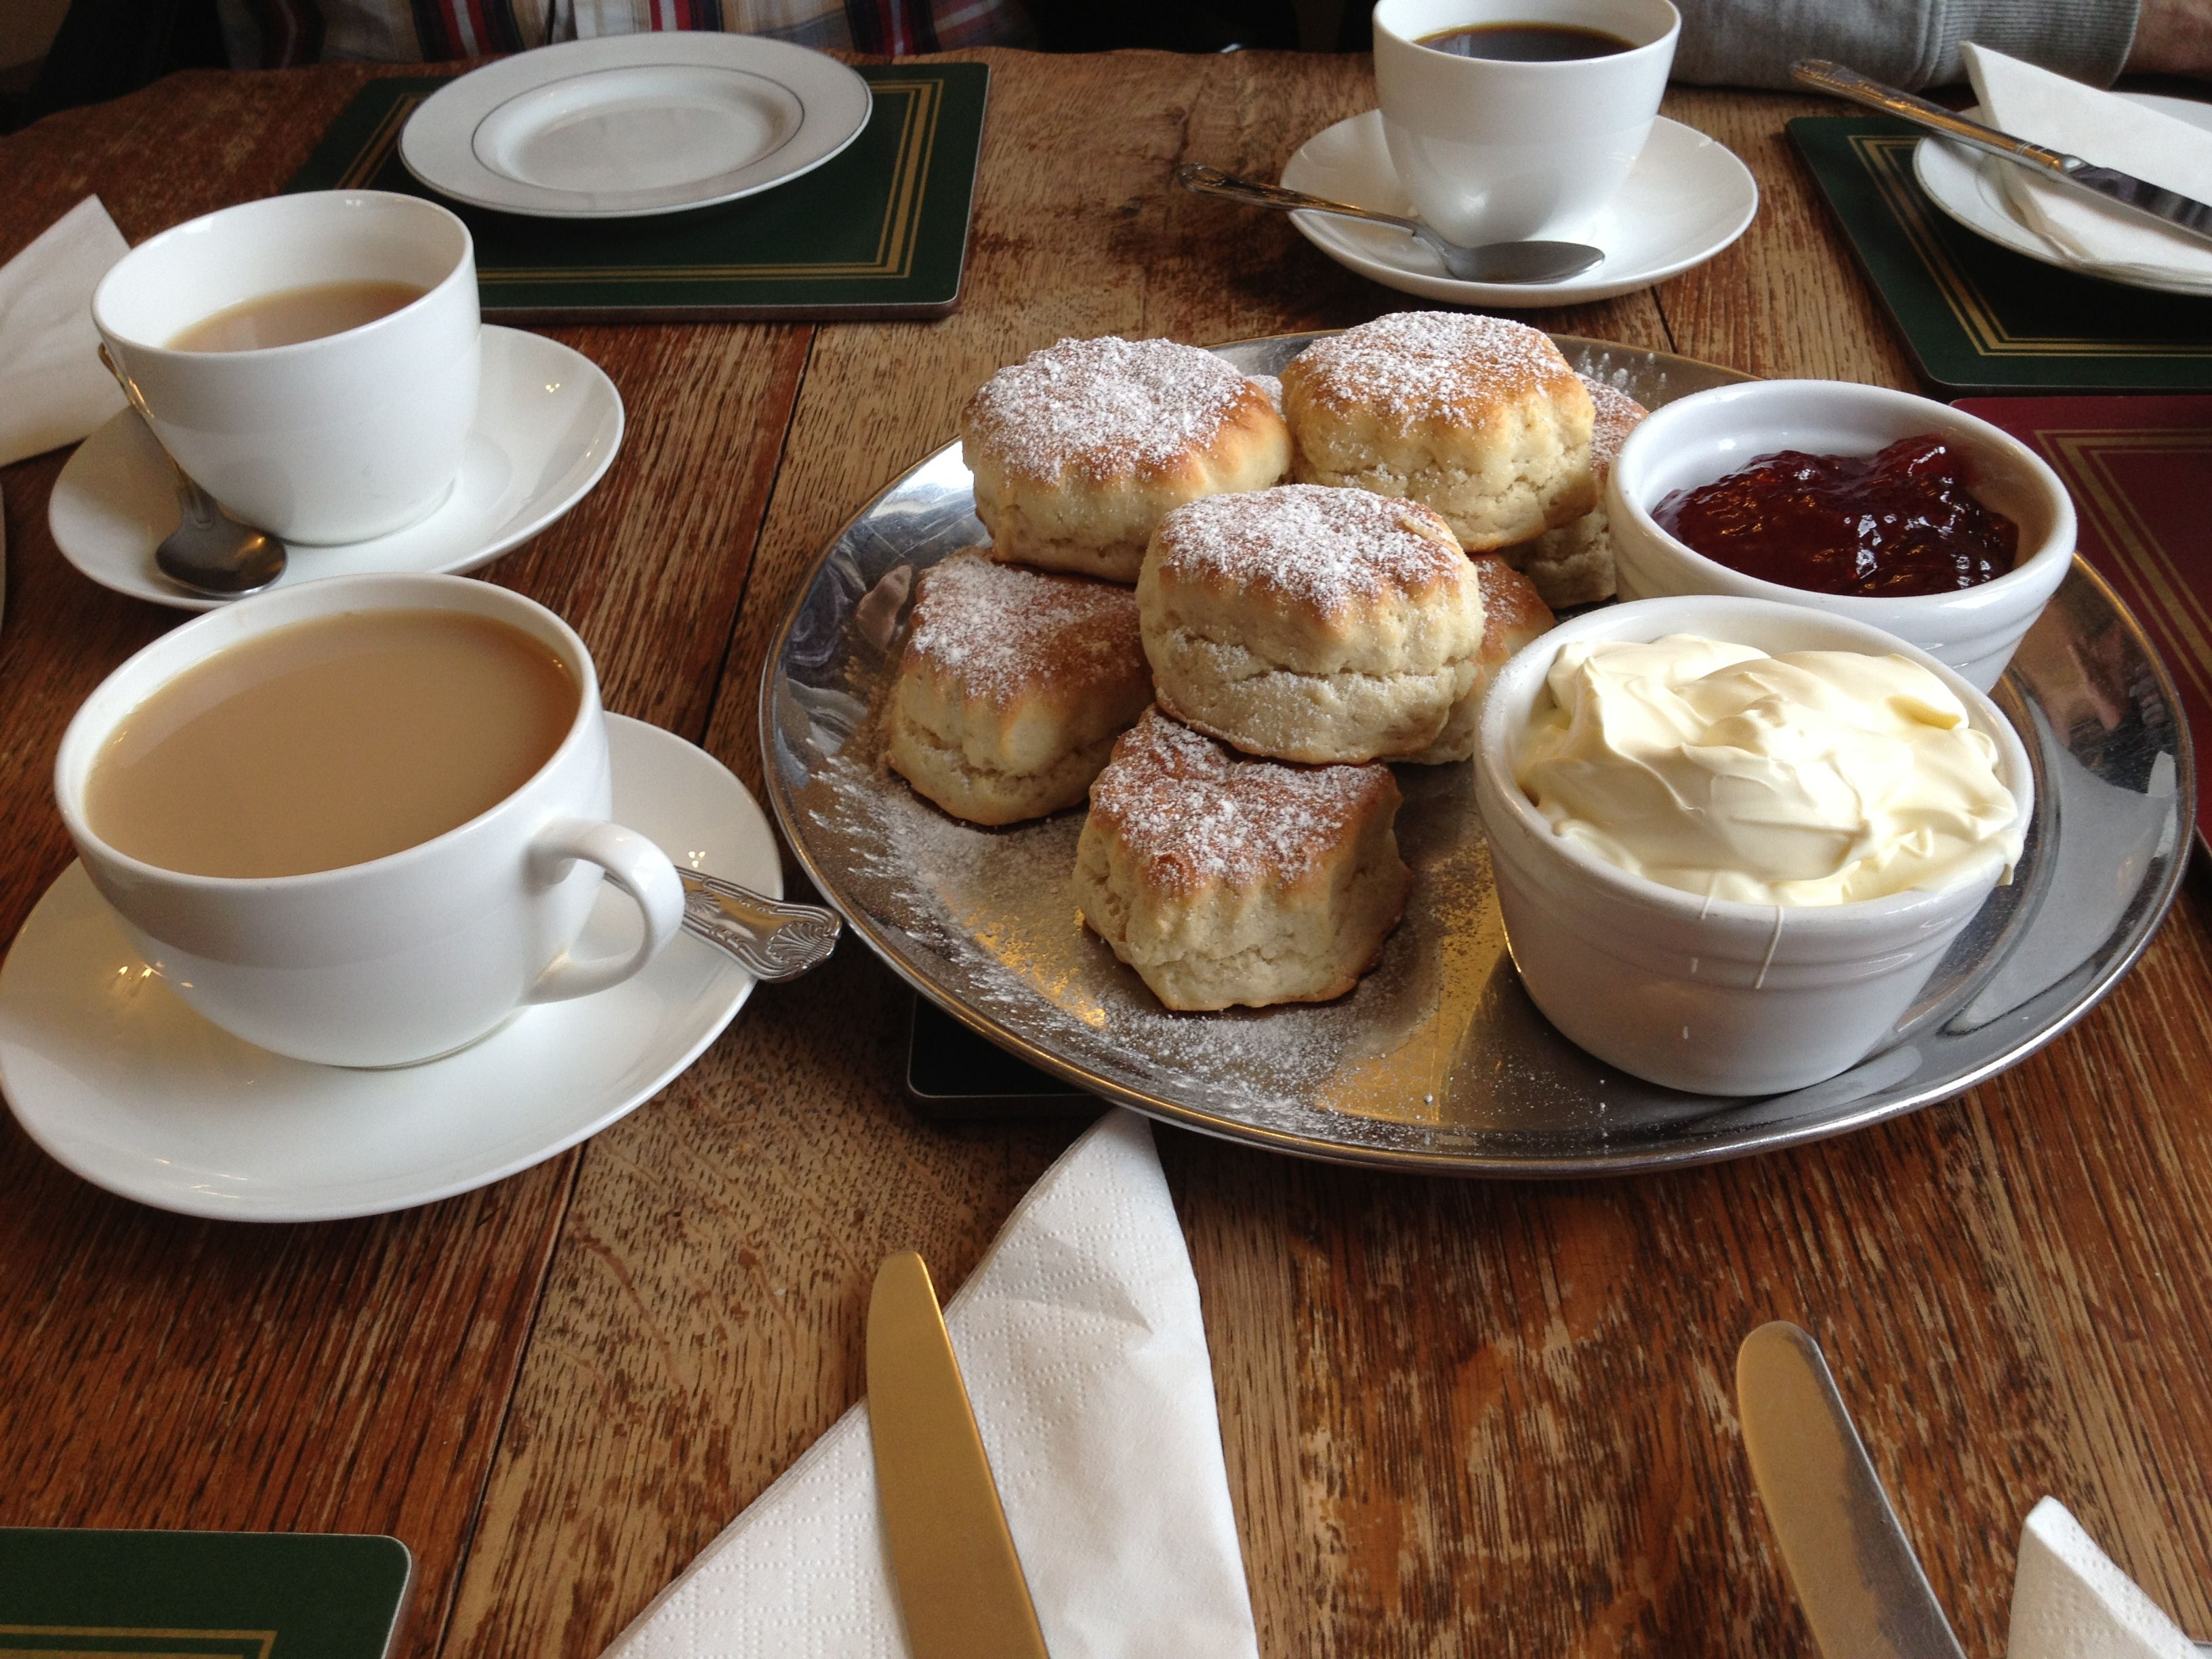 english tea time foodies pinterest english tea time tea time and teas. Black Bedroom Furniture Sets. Home Design Ideas